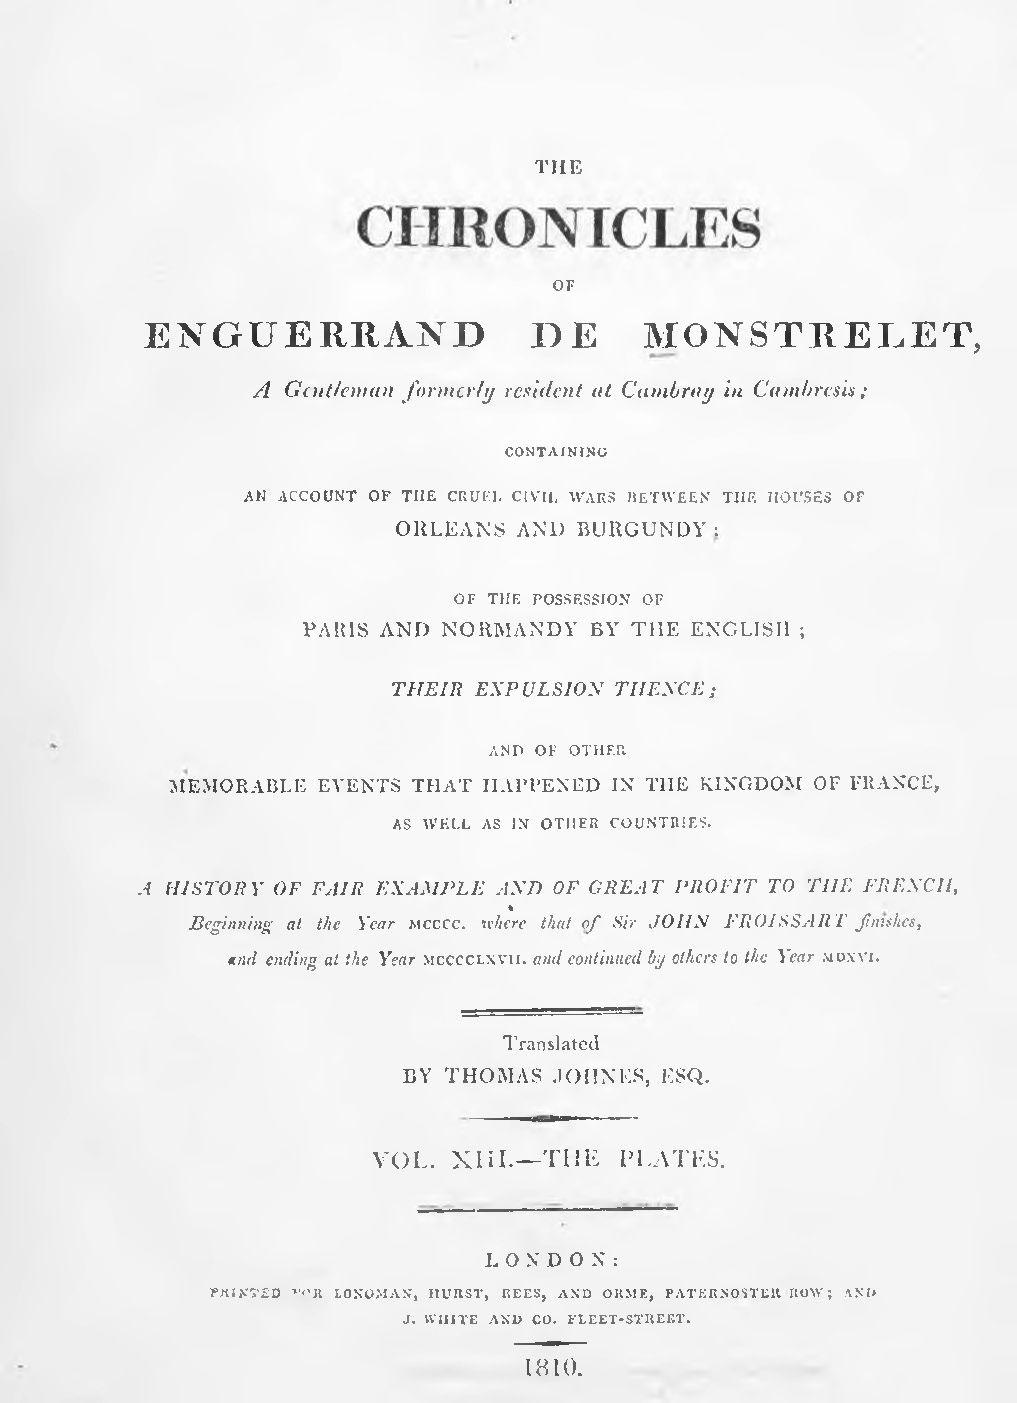 Enguerrand de Monstrelet chronicle vol.13